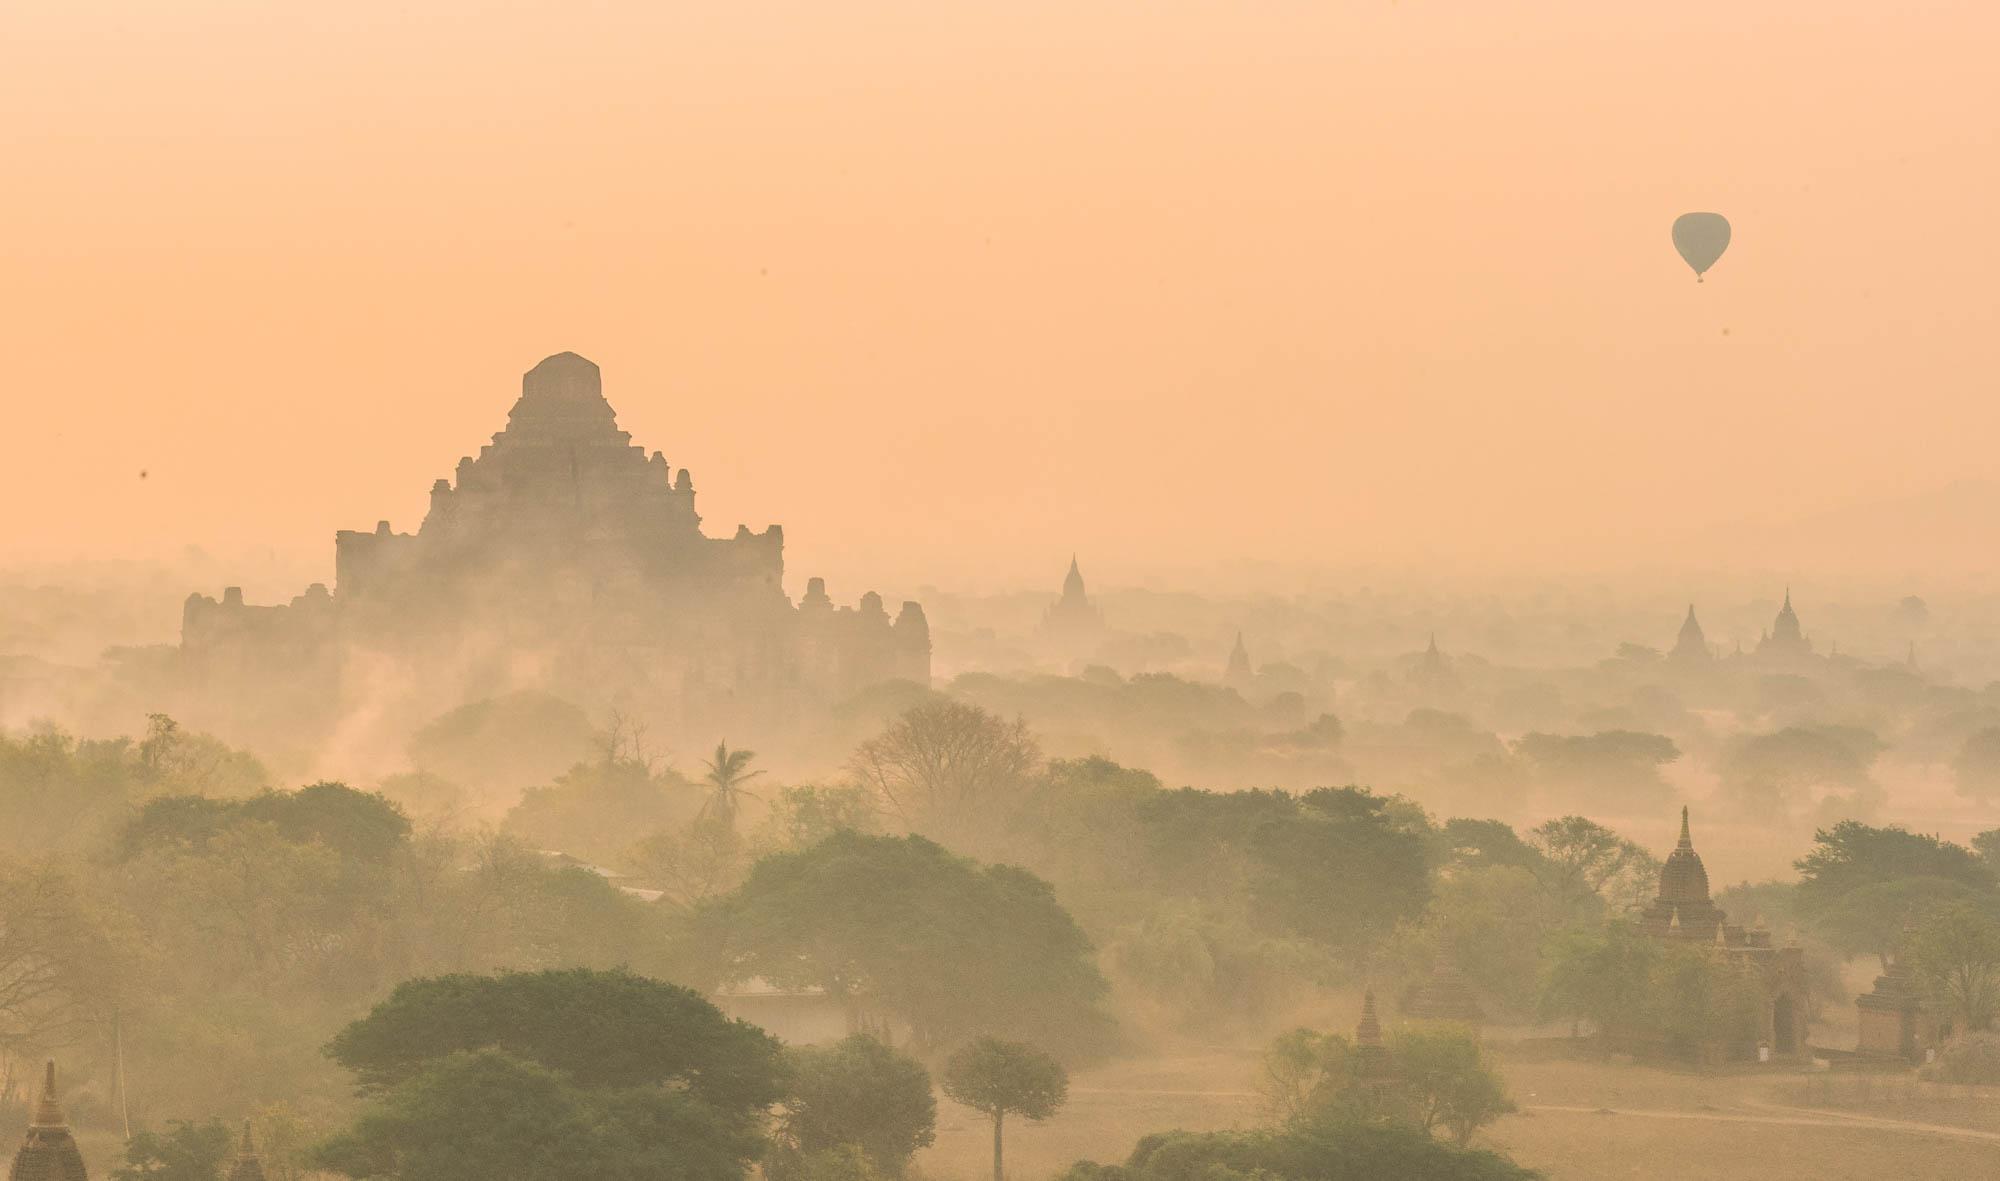 The Incredible pagodas of Bagan, Myanmar